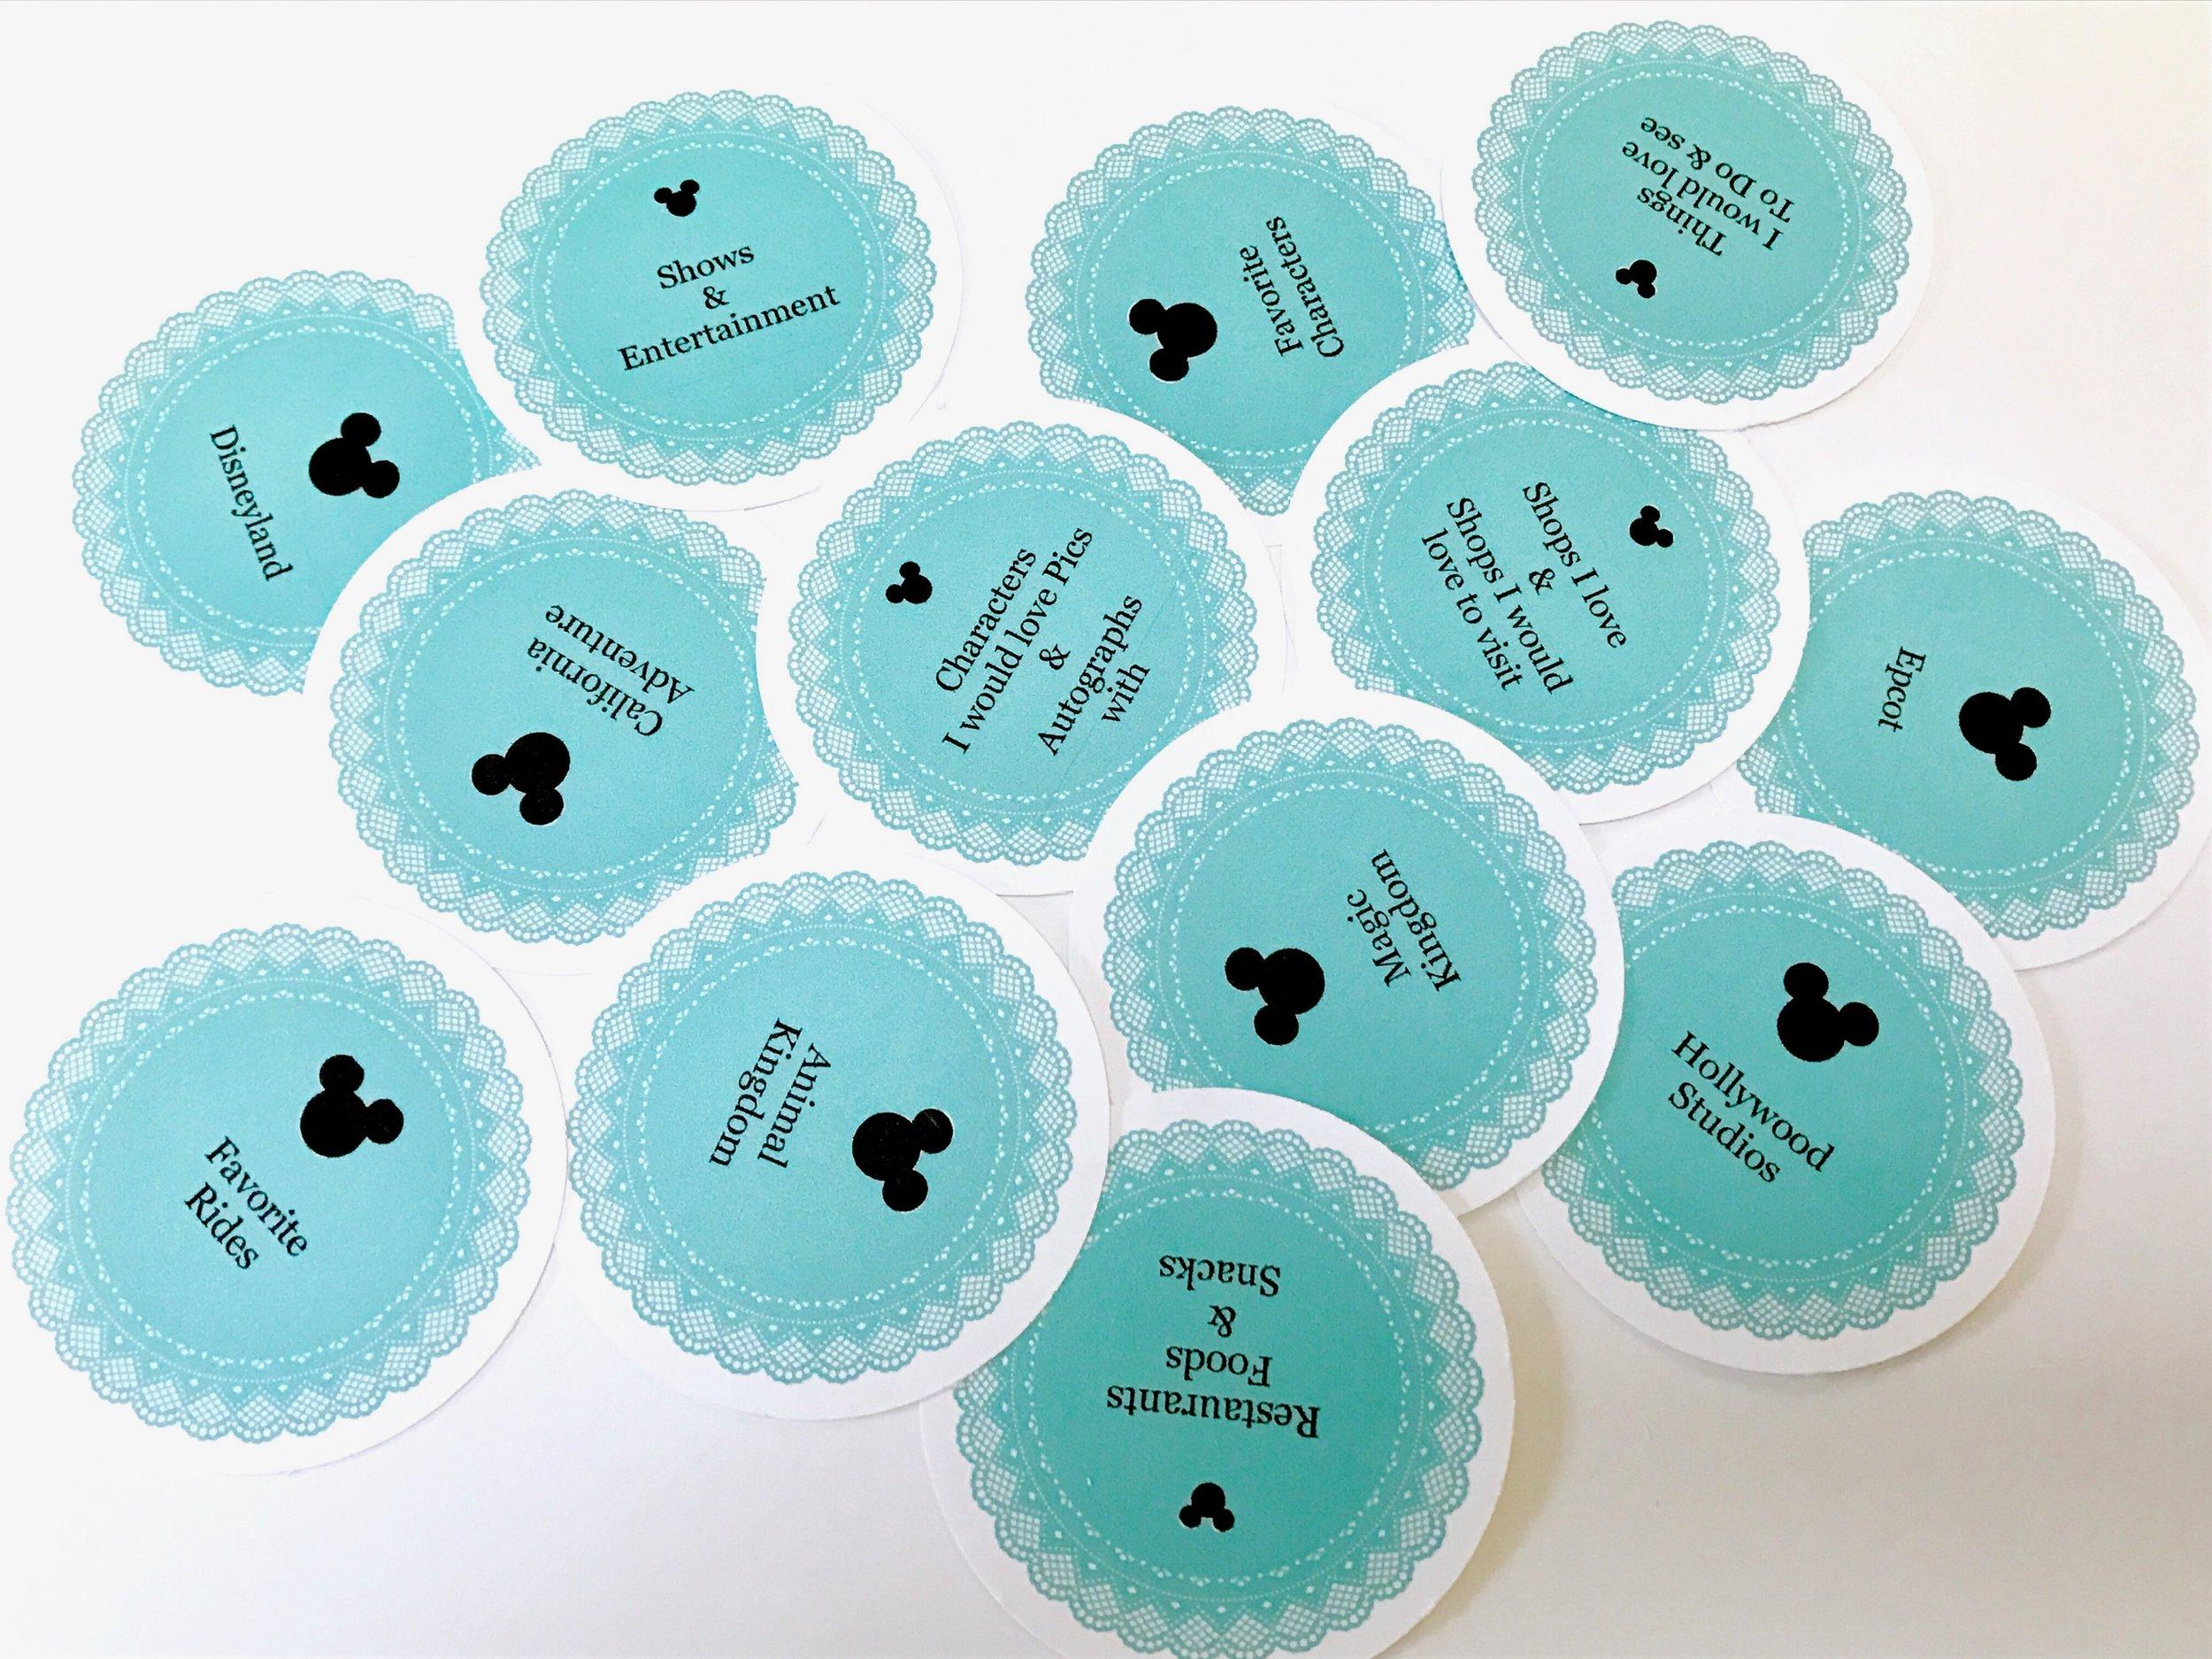 blue Disney themed labels